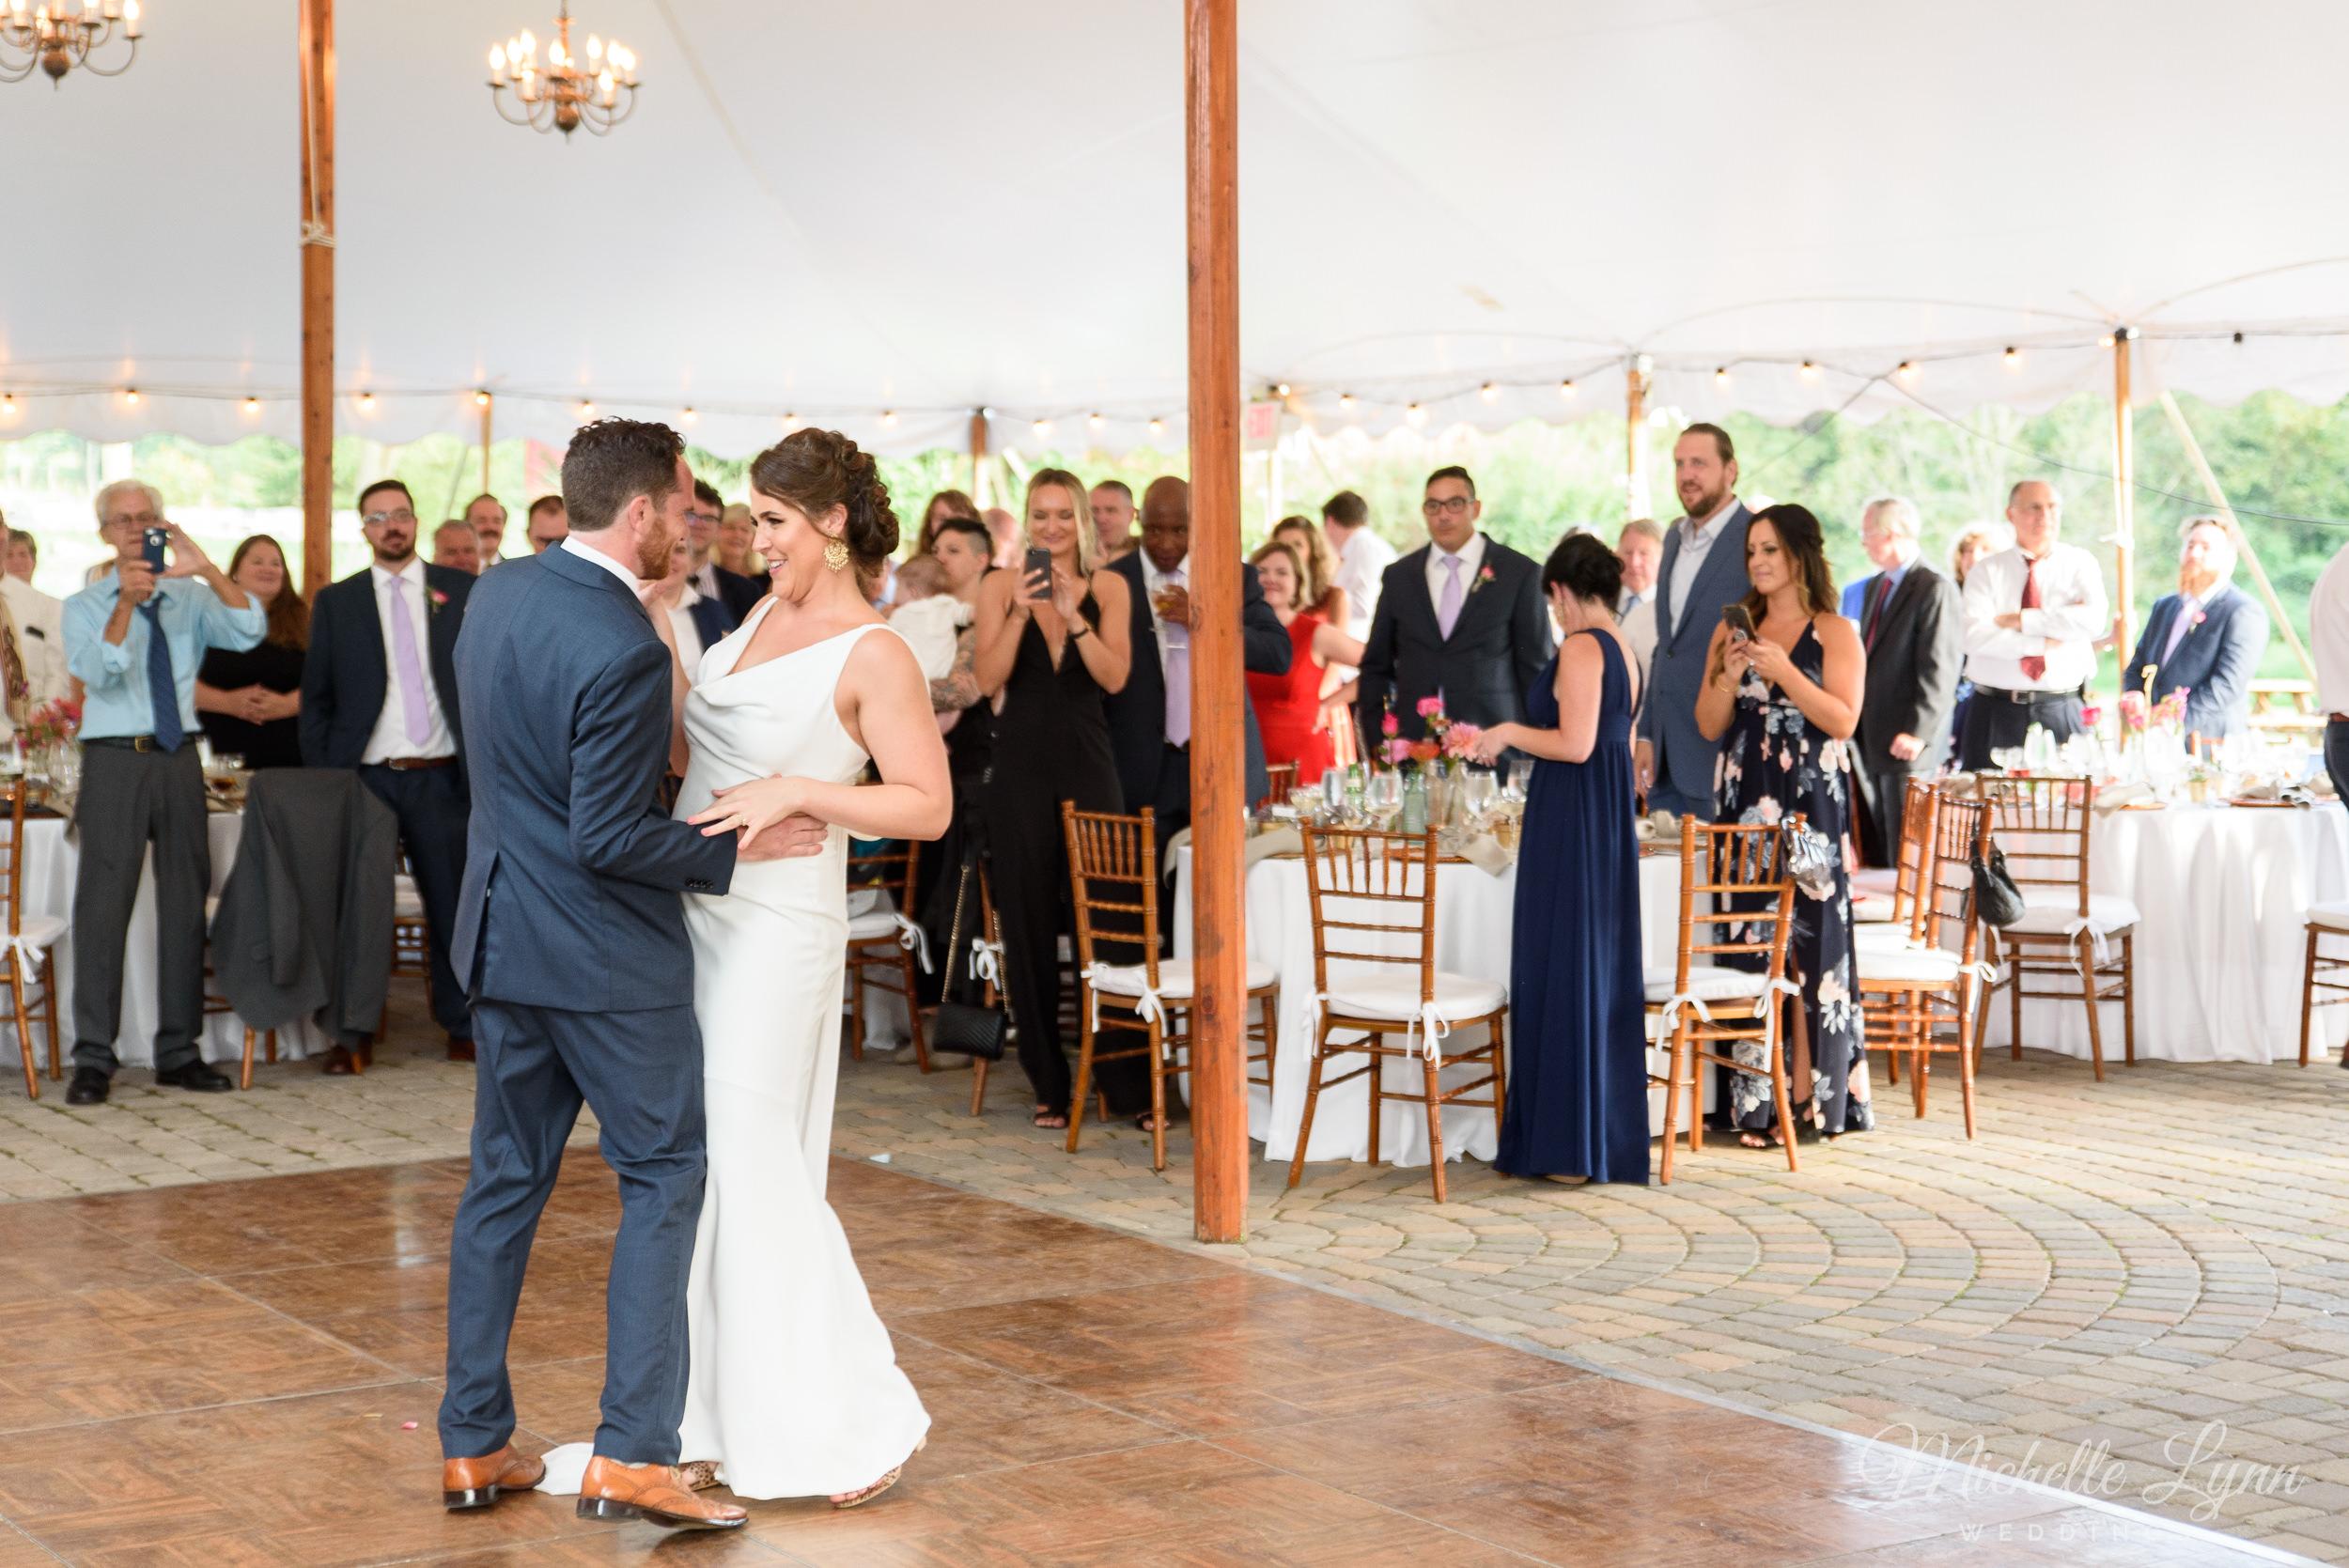 mlw-unionville-vineyards-nj-wedding-photography-80.jpg